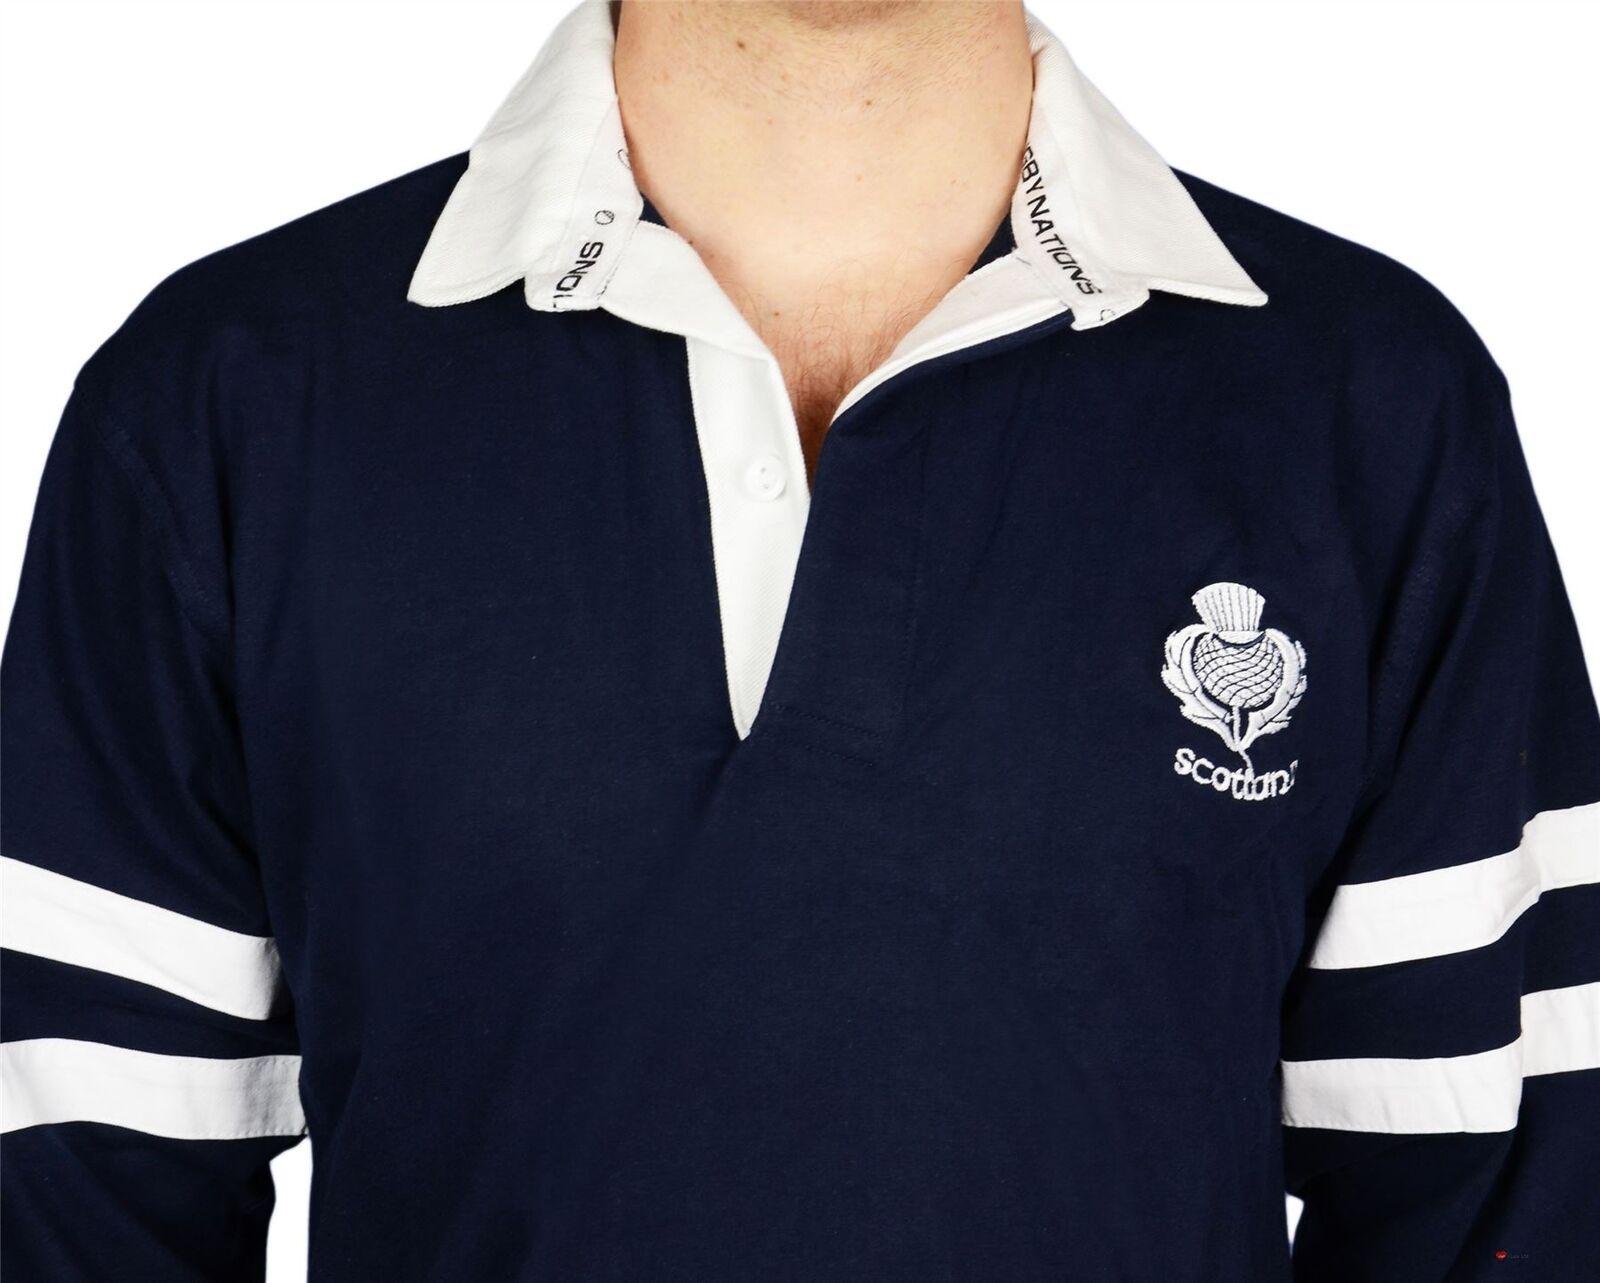 Mens  Scottish Rugby Shirt 2 Stripe Stripe Stripe and Thistle Long Sleeve Navy Medium  | Export  9110b5